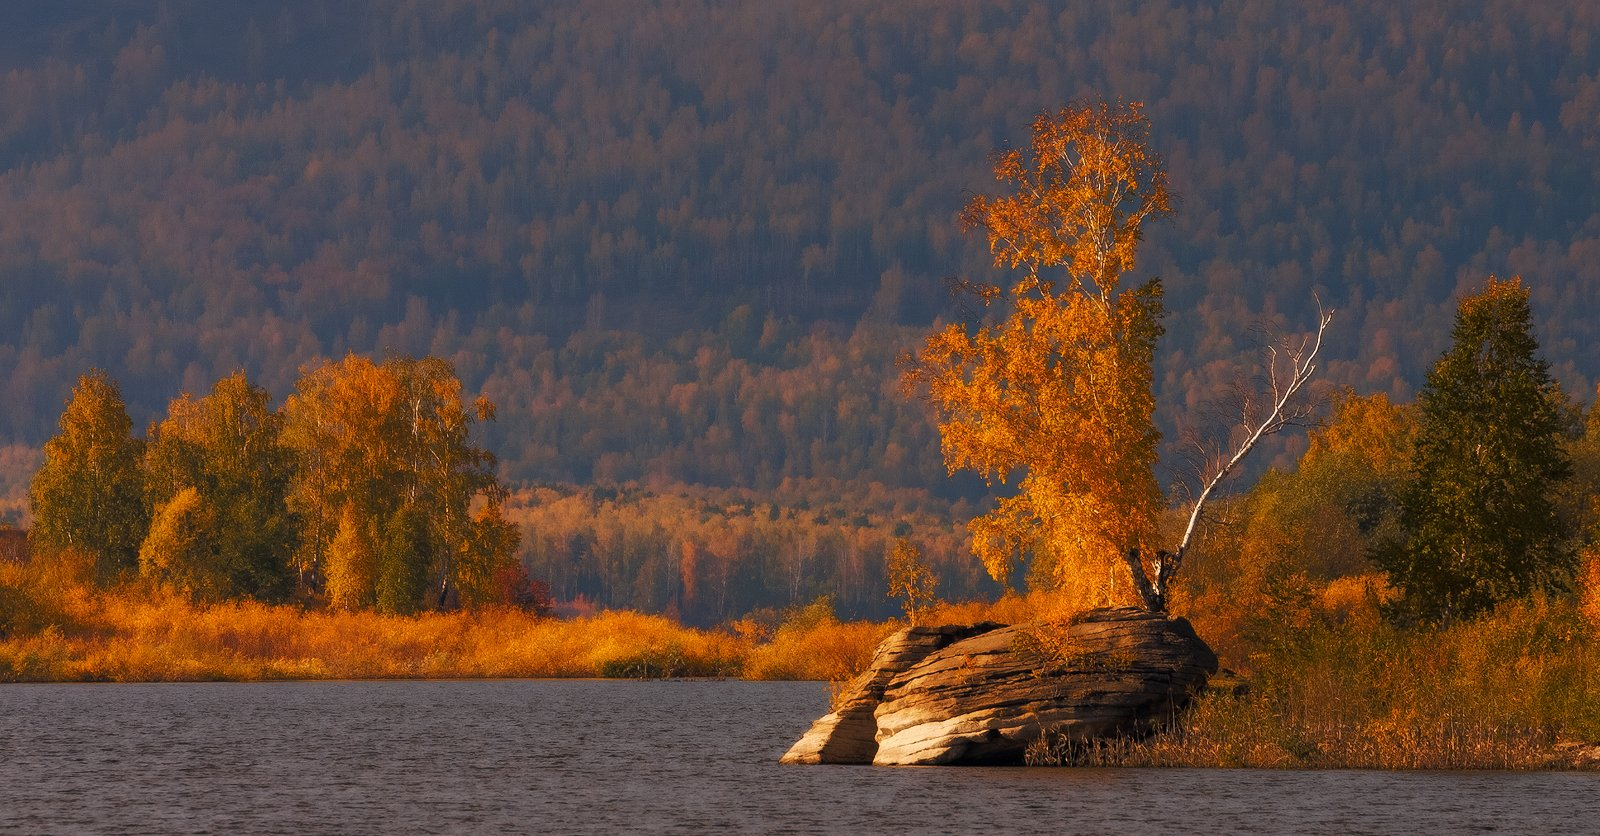 аргази, золотая осень, озеро, осень, Михаил Трахтенберг ( t_berg )